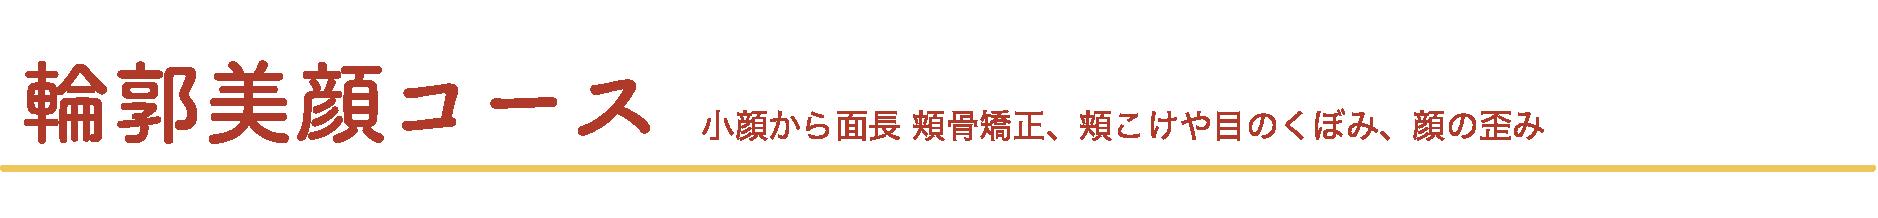 midashi 18 - 輪郭美顔コース